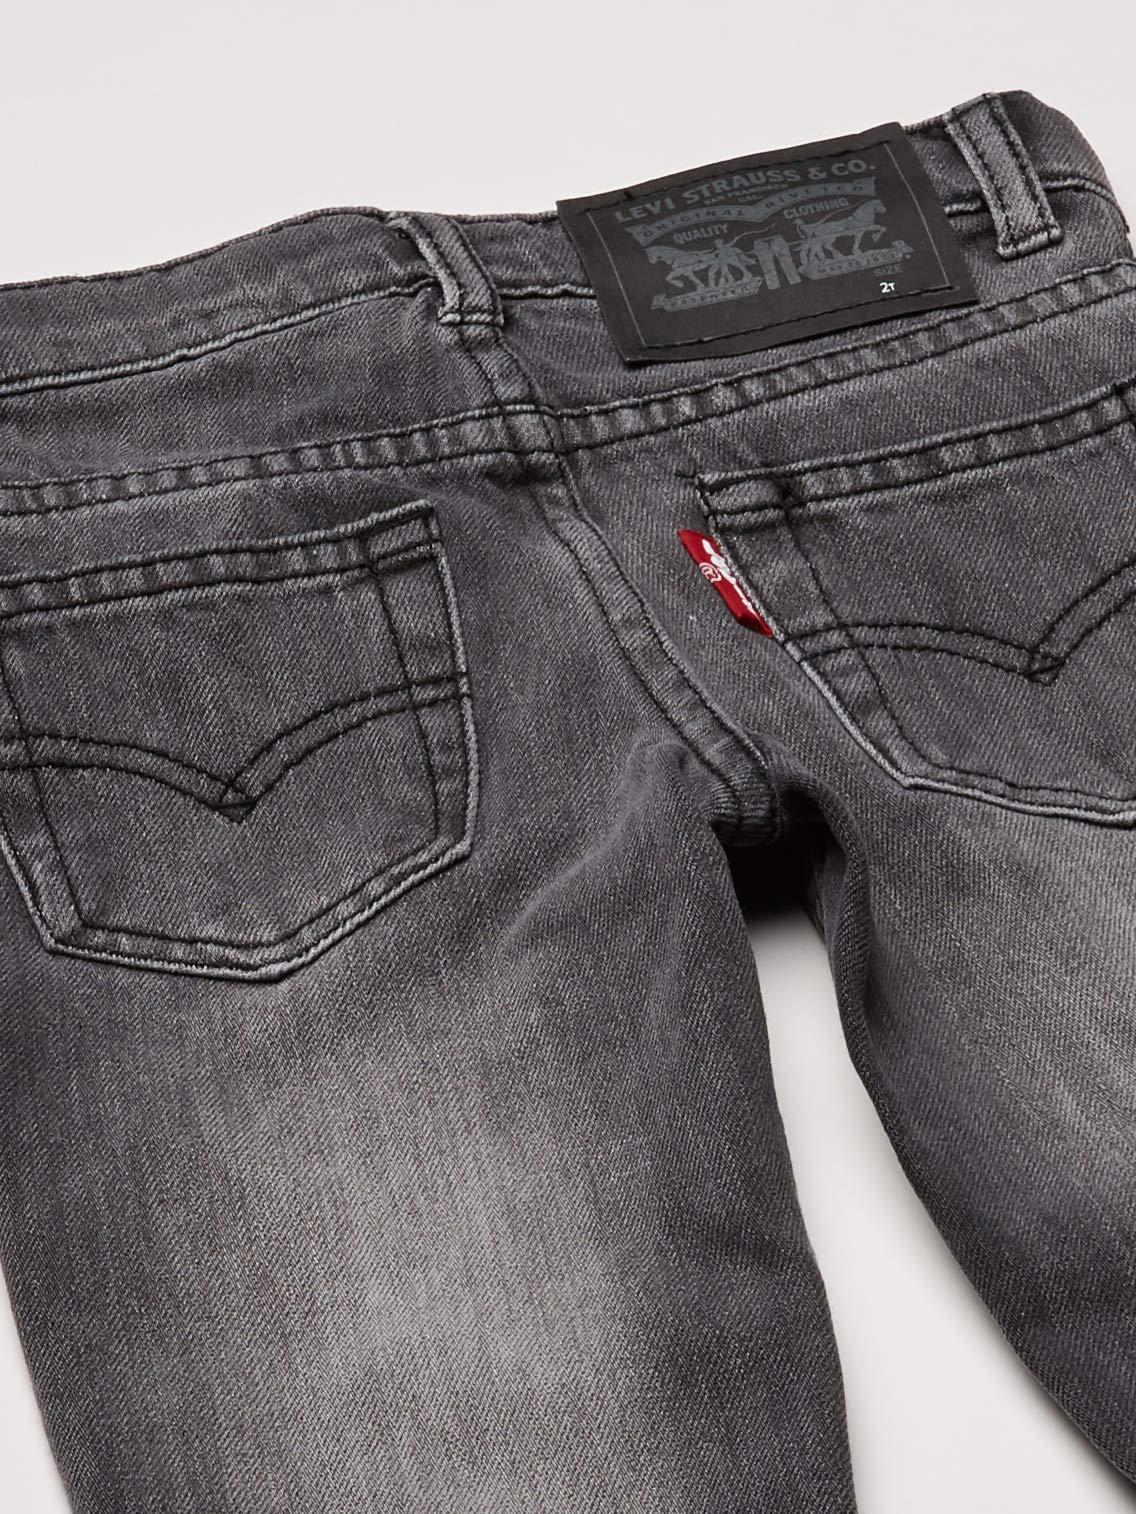 Levis-Boys-502-Regular-Fit-Taper-Jeans